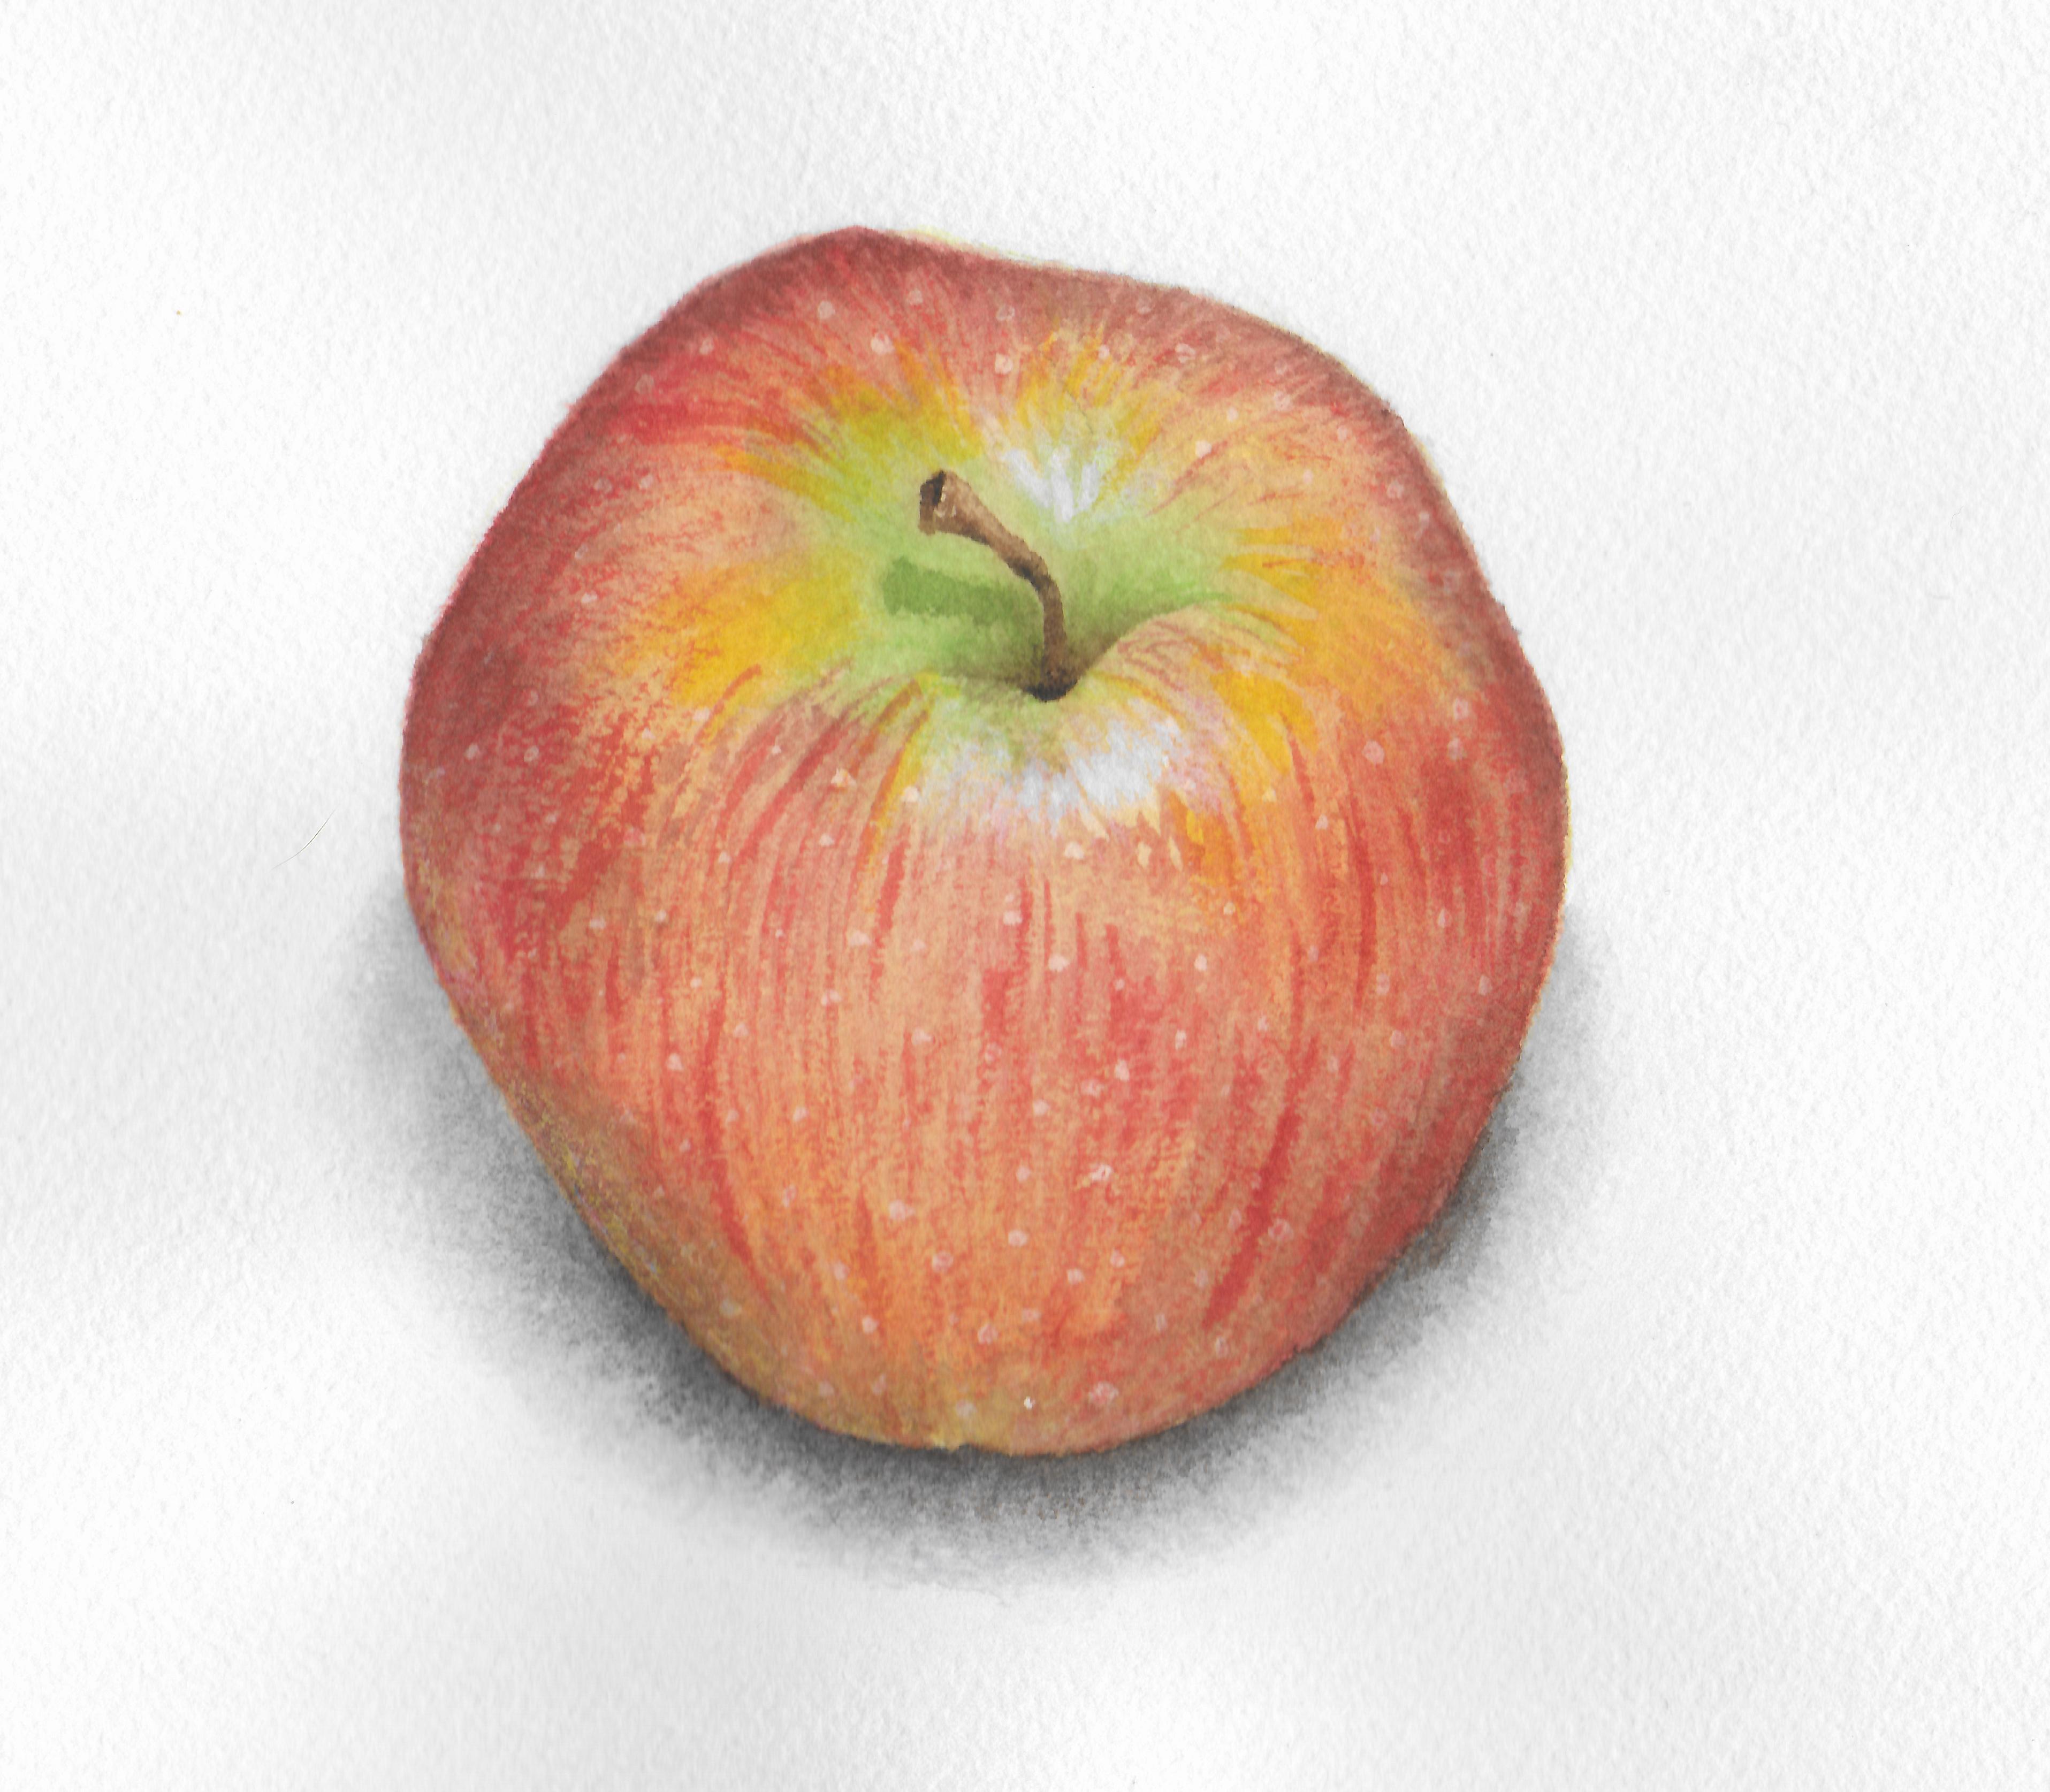 Apple - Watercolor